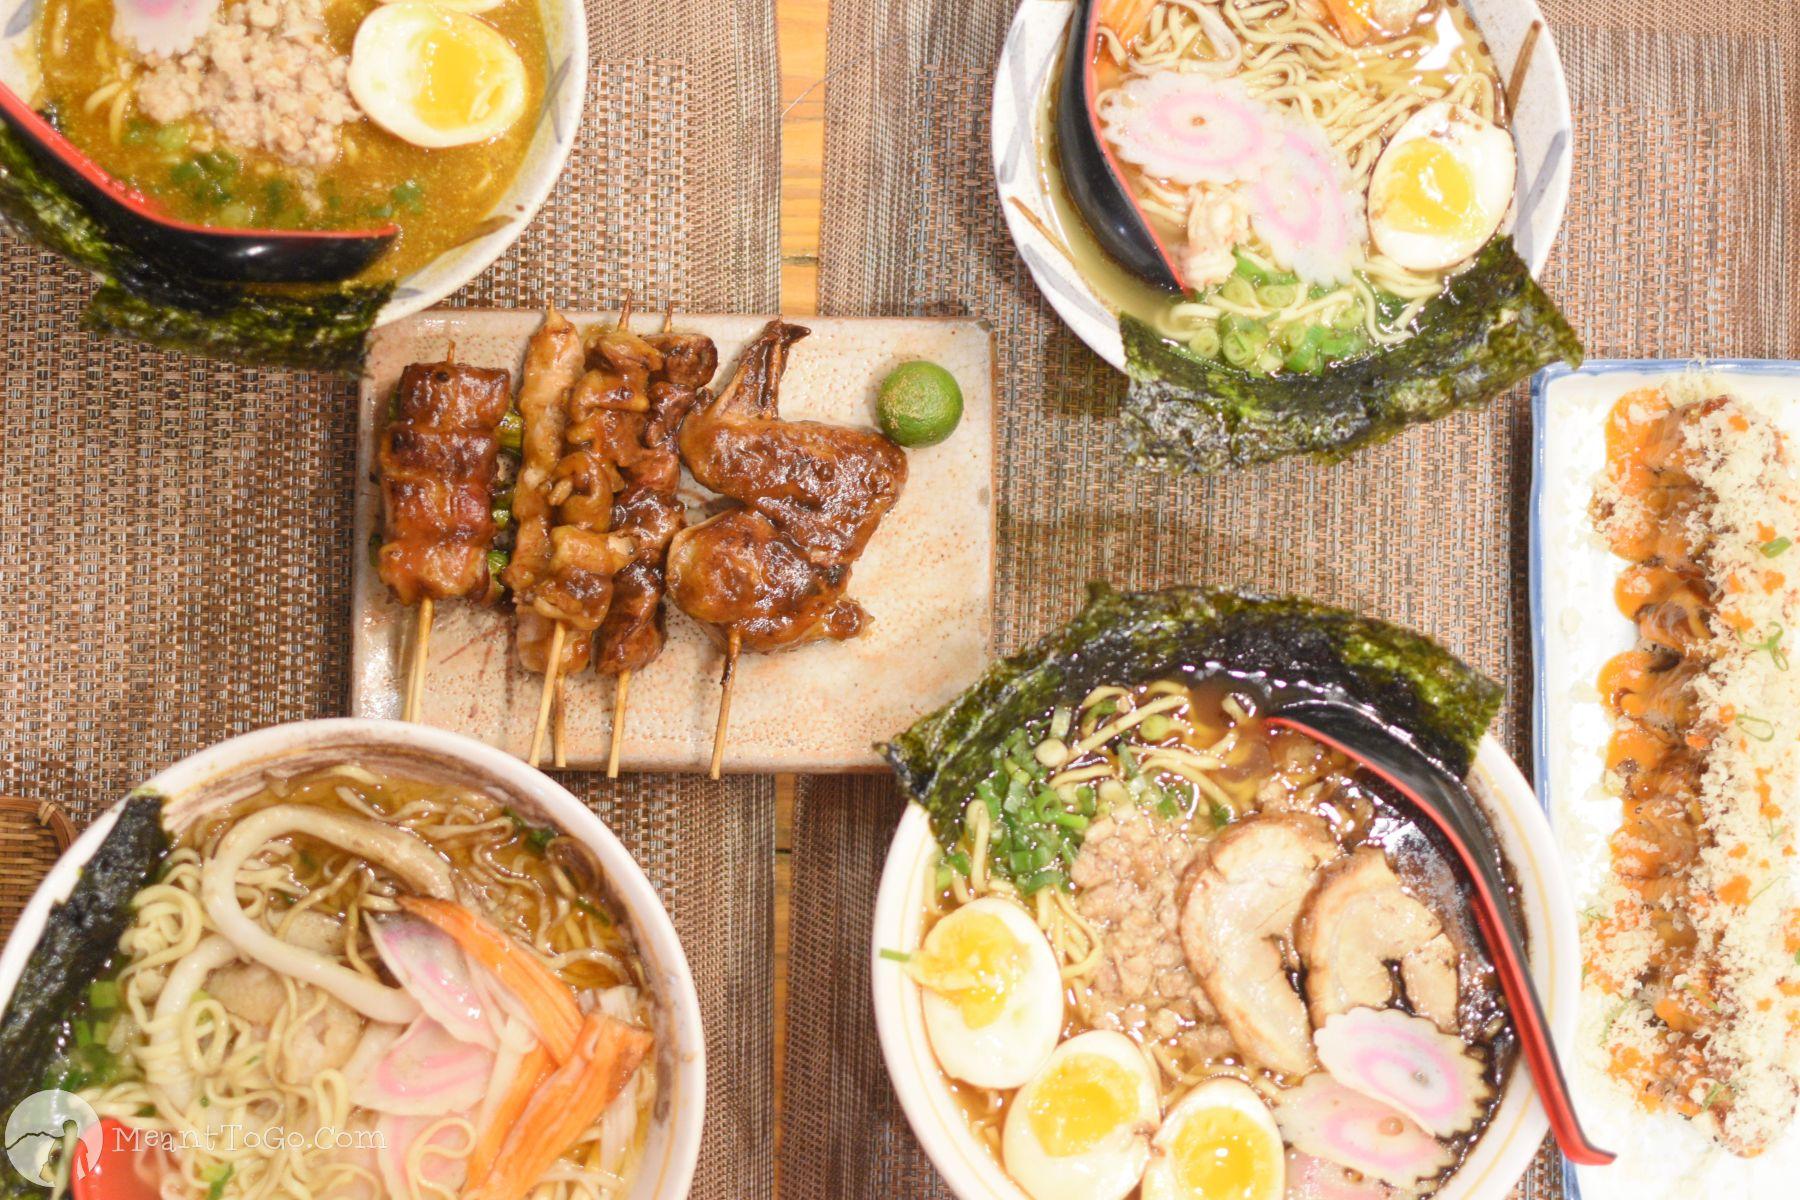 Kaizen Davao - Japanese Street Dining Restaurant